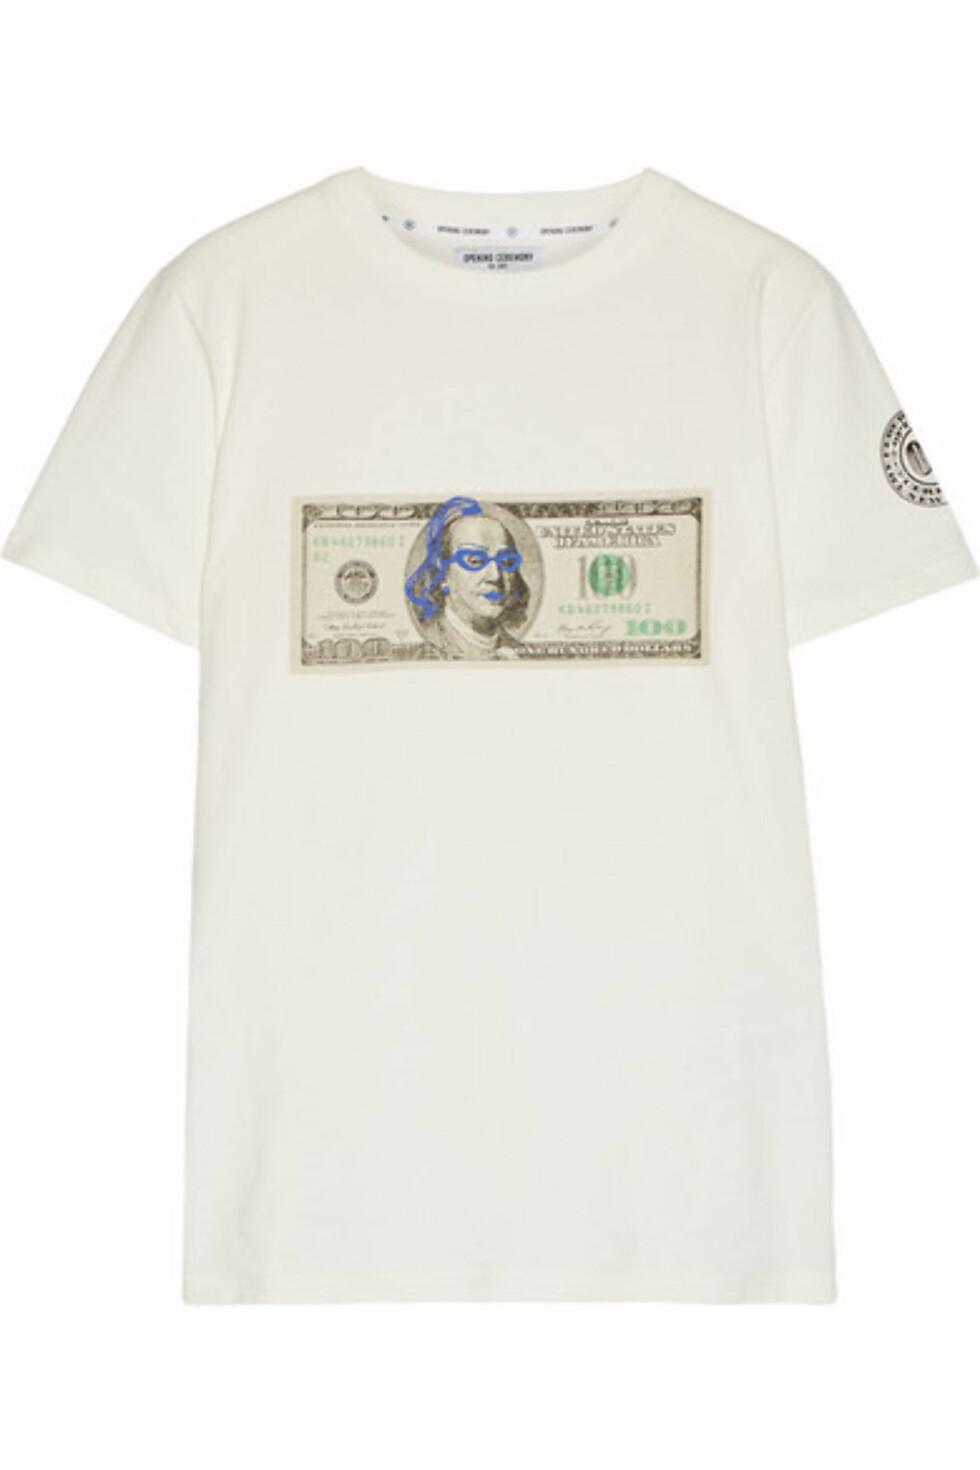 T-skjorte fra Opening Ceremony via Net-a-porter.com | kr 1687 | https://www.net-a-porter.com/no/en/product/715369/Opening_Ceremony/ben-printed-cotton-jersey-t-shirt